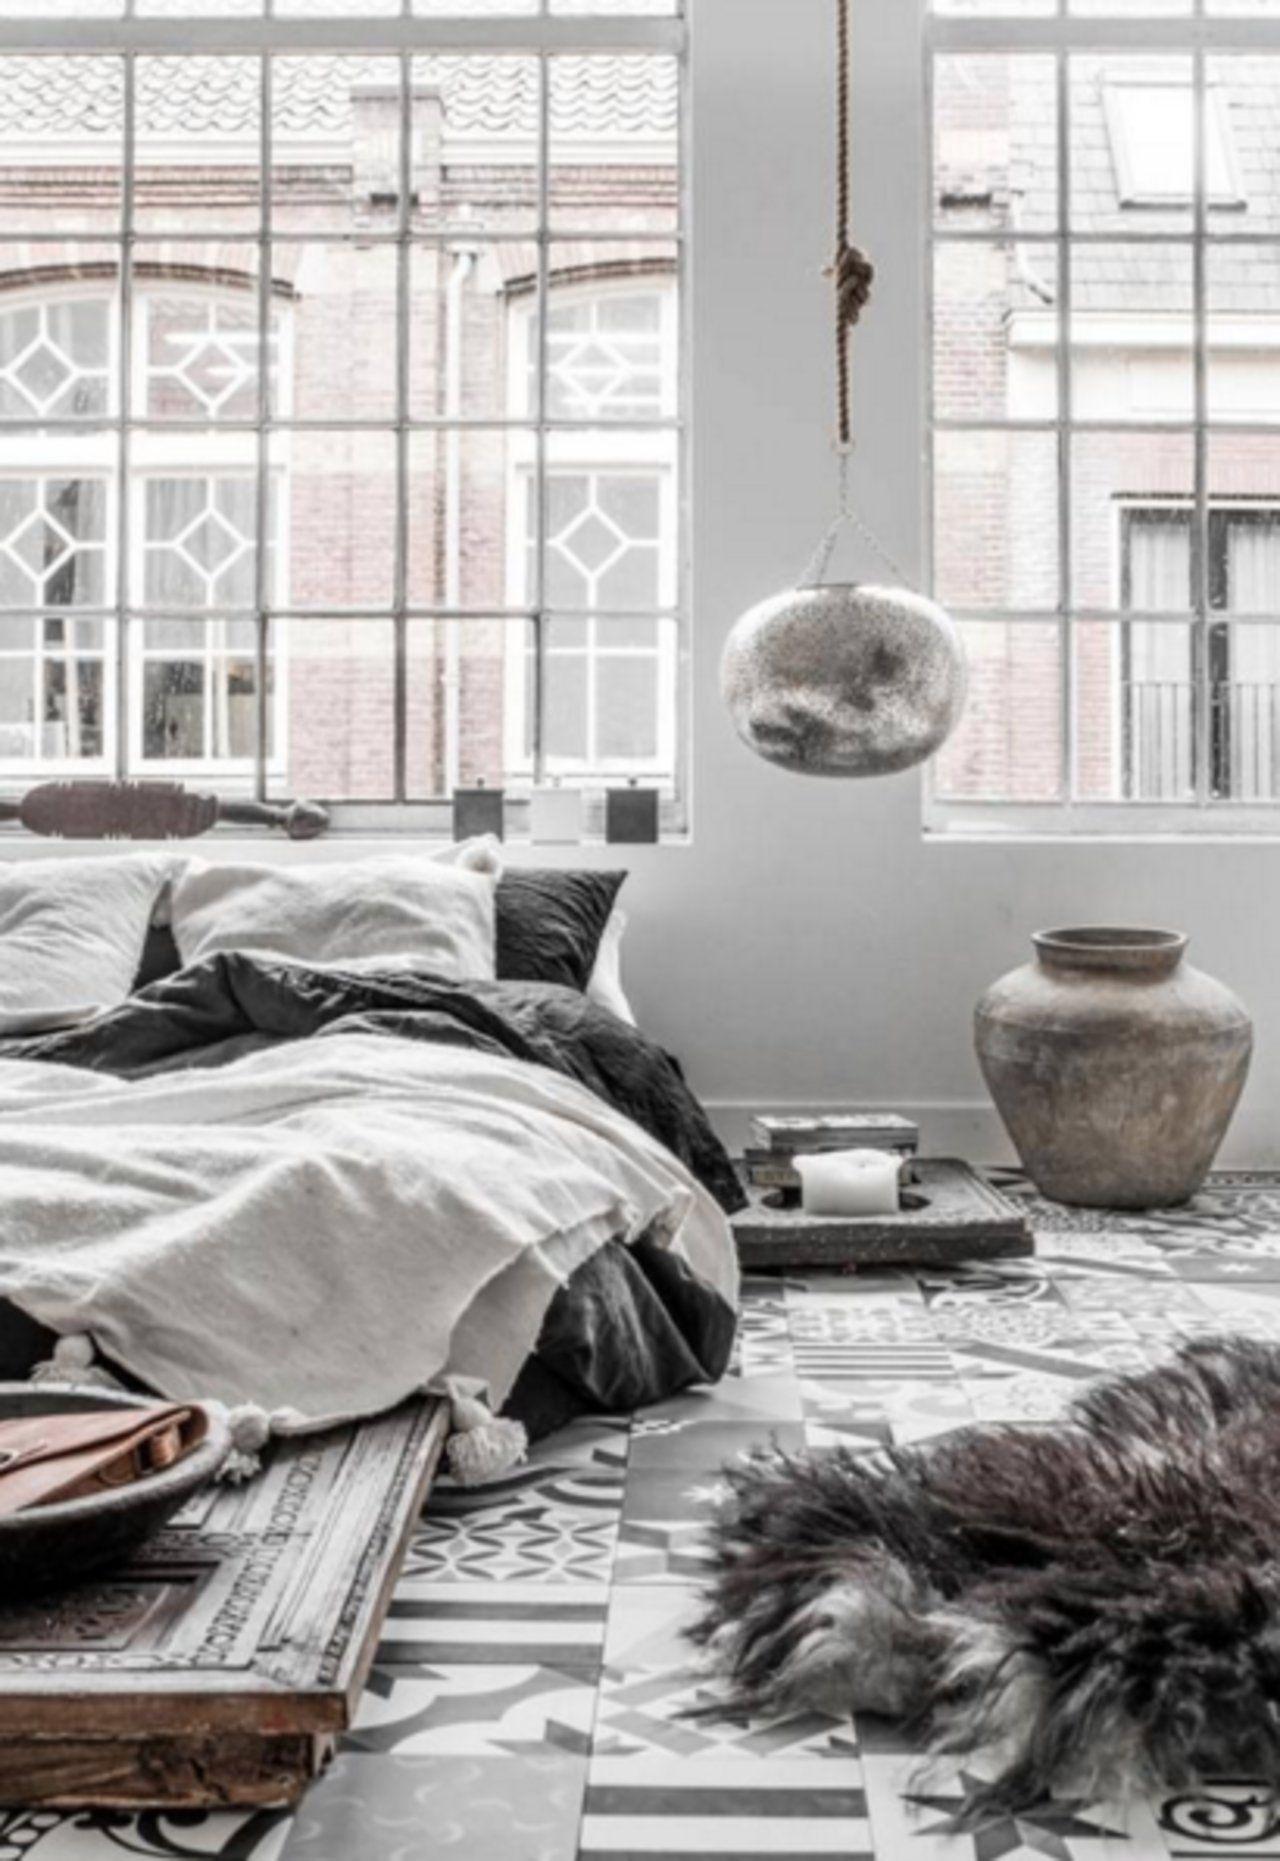 10 Beds We D Like To Sleep In Scandinavian Bedroom Decor Scandinavian Interior Bedroom Chic Bedroom Decor